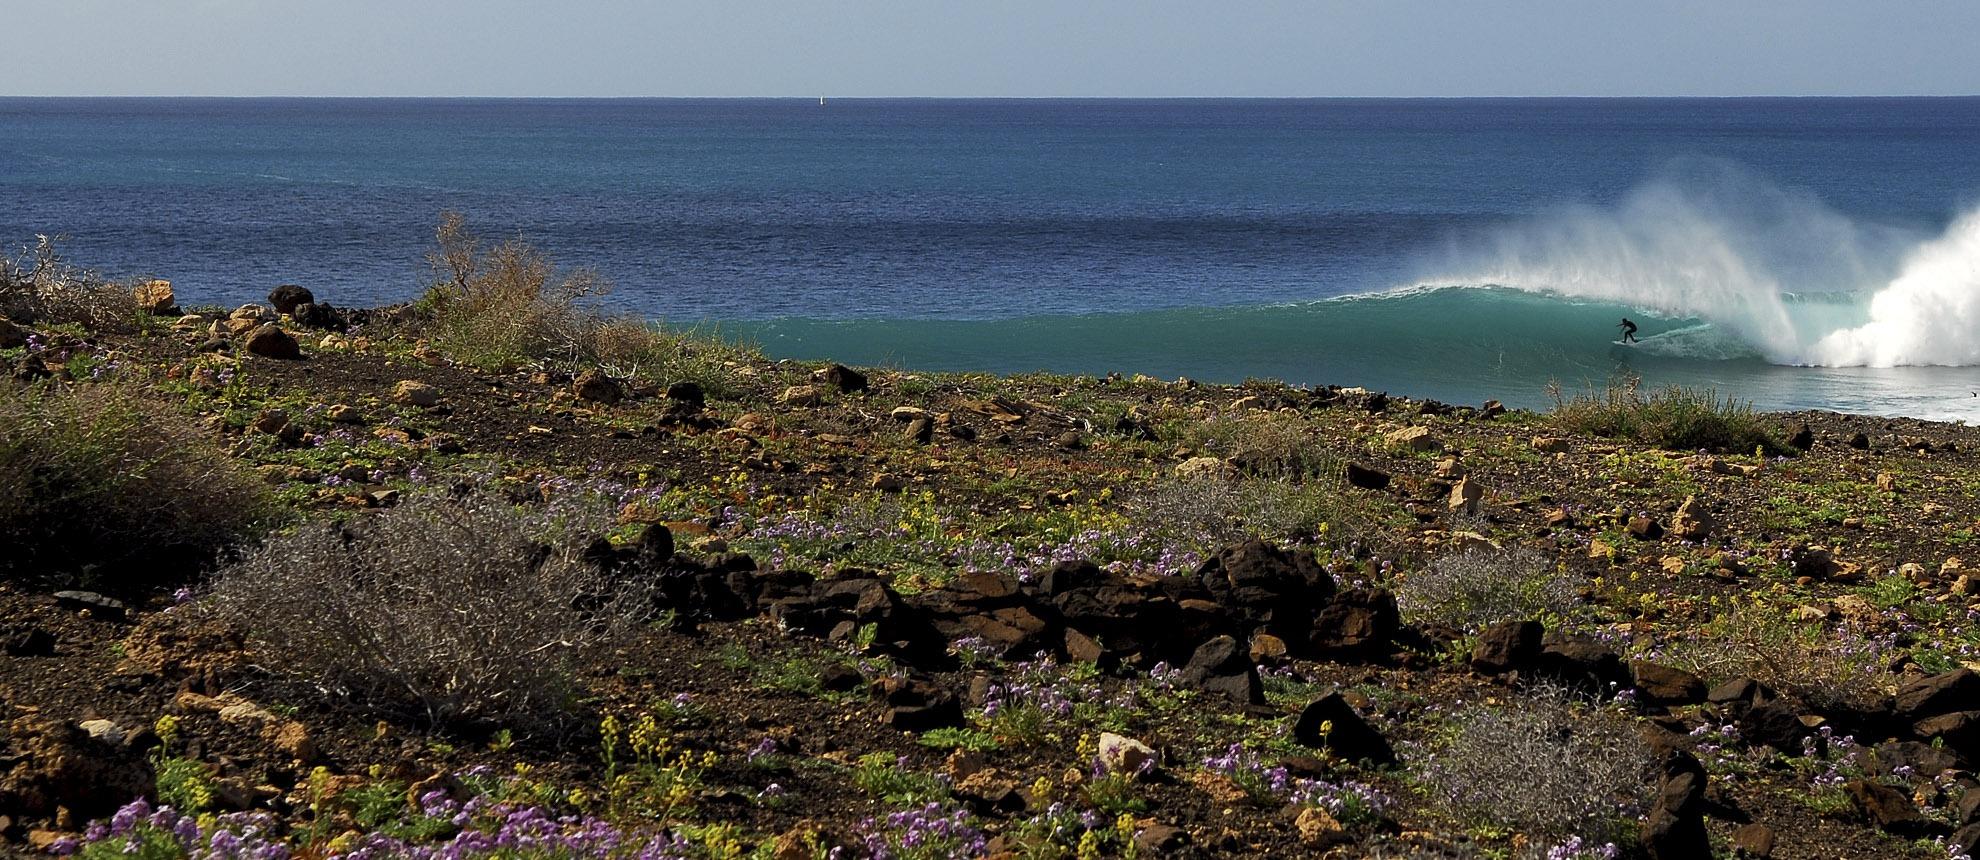 Edu donde quieres ir a surfear